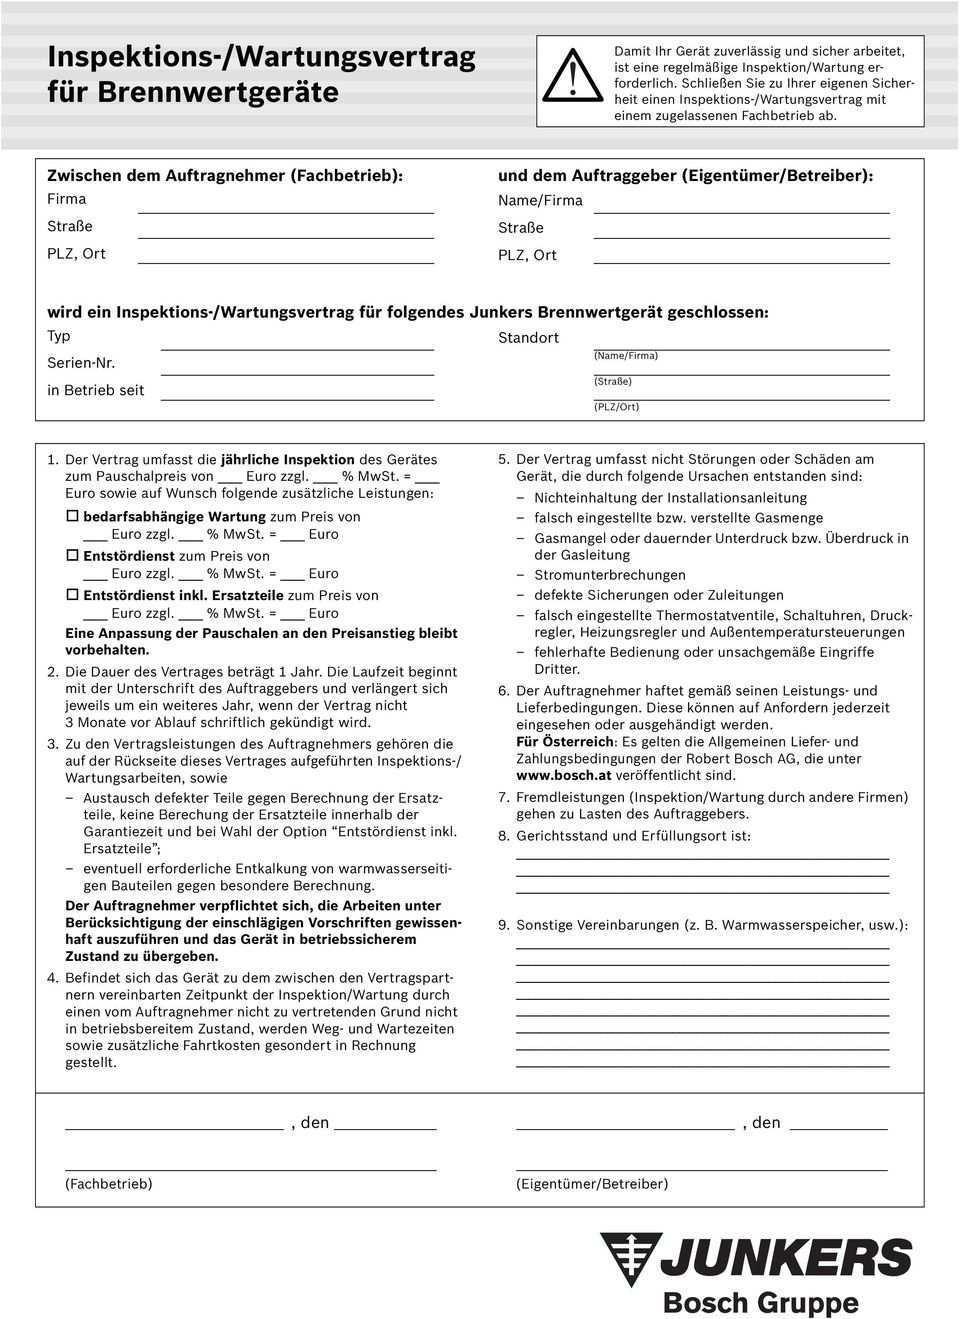 Inspektions Wartungsvertrag Fur Brennwertgerate Pdf Free Download